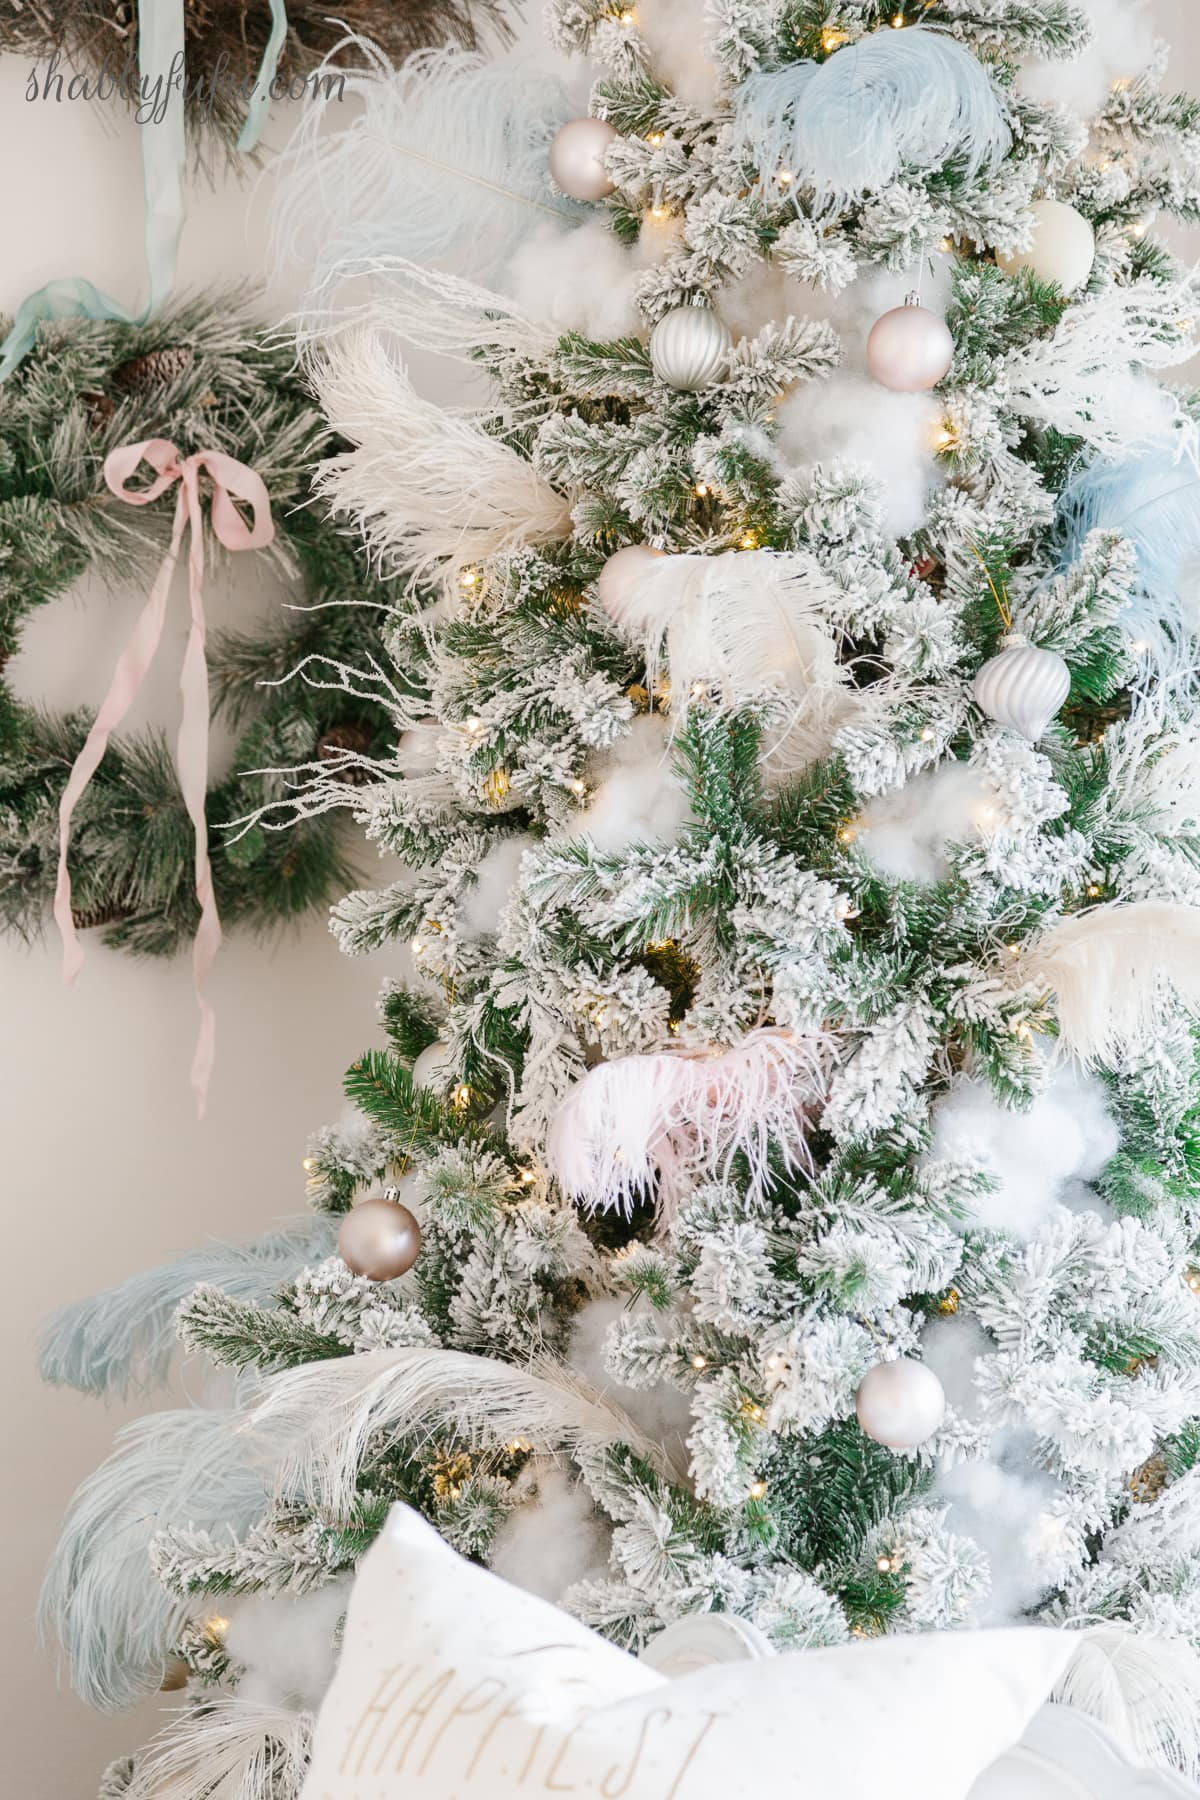 making a little Christmas magic